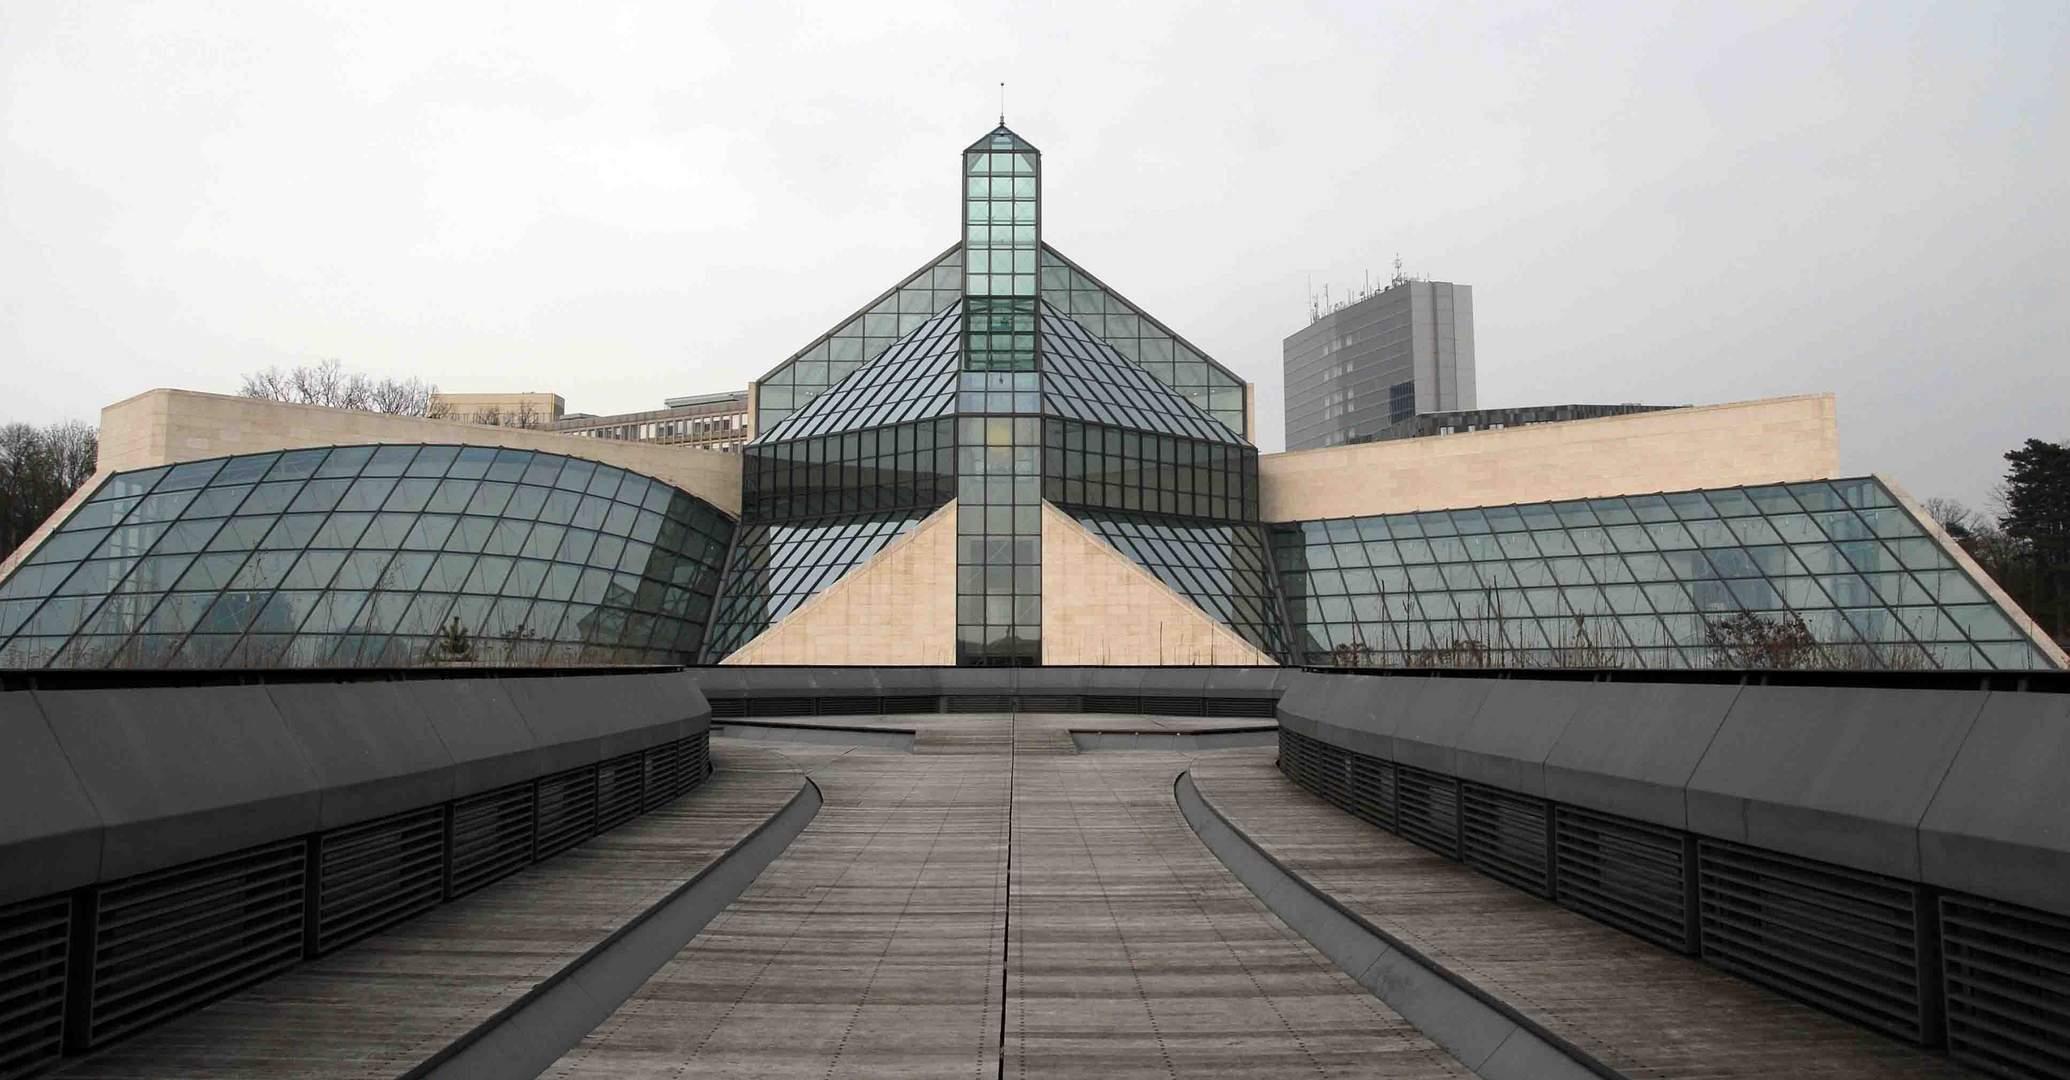 Pei museum Luxemburg